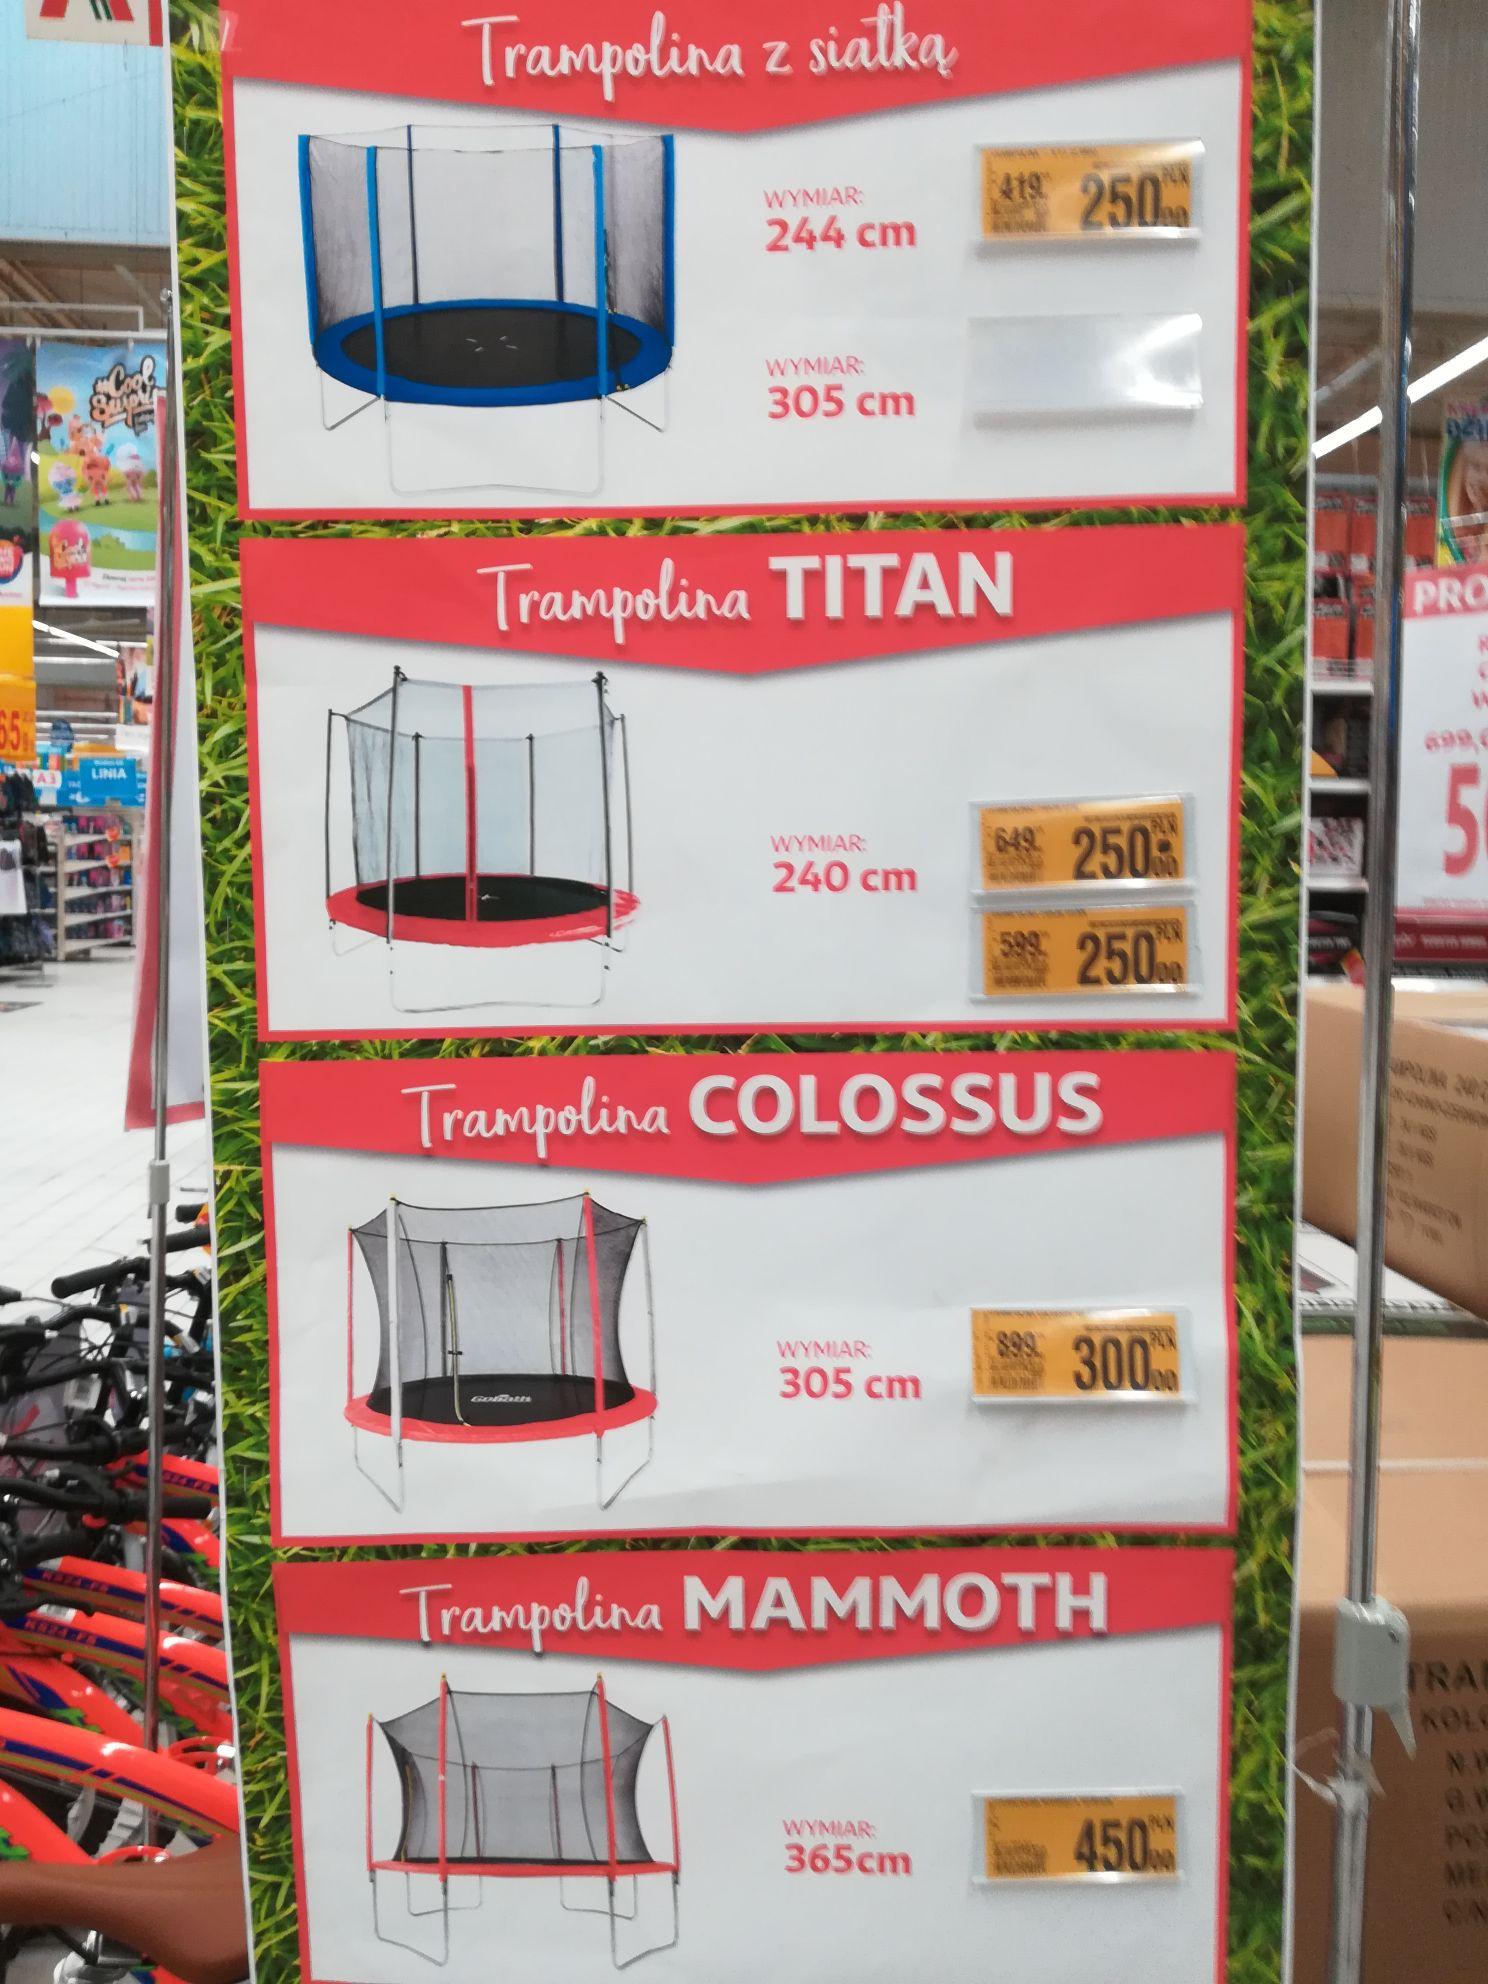 Trampolina Colossus sr 305cm Auchan katowice DTS